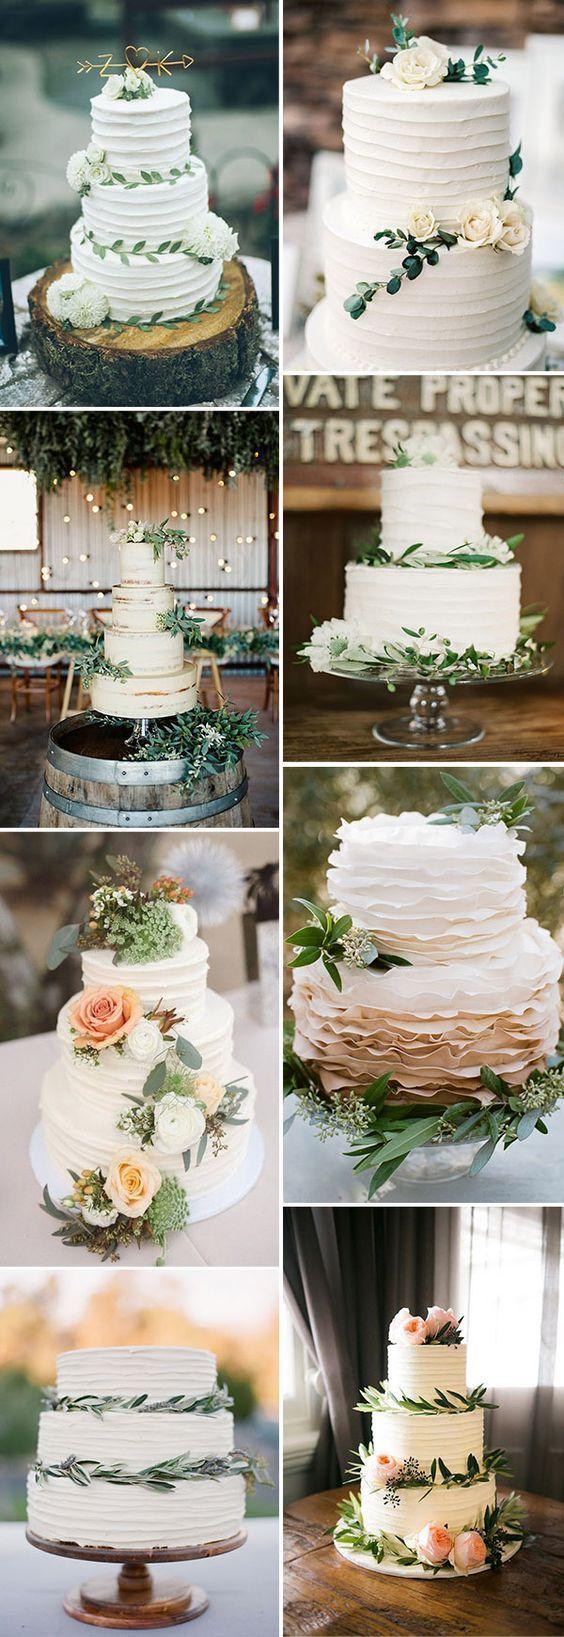 Wedding decorations made with cricut october 2018  best Wedding images on Pinterest  Wedding ideas Short wedding